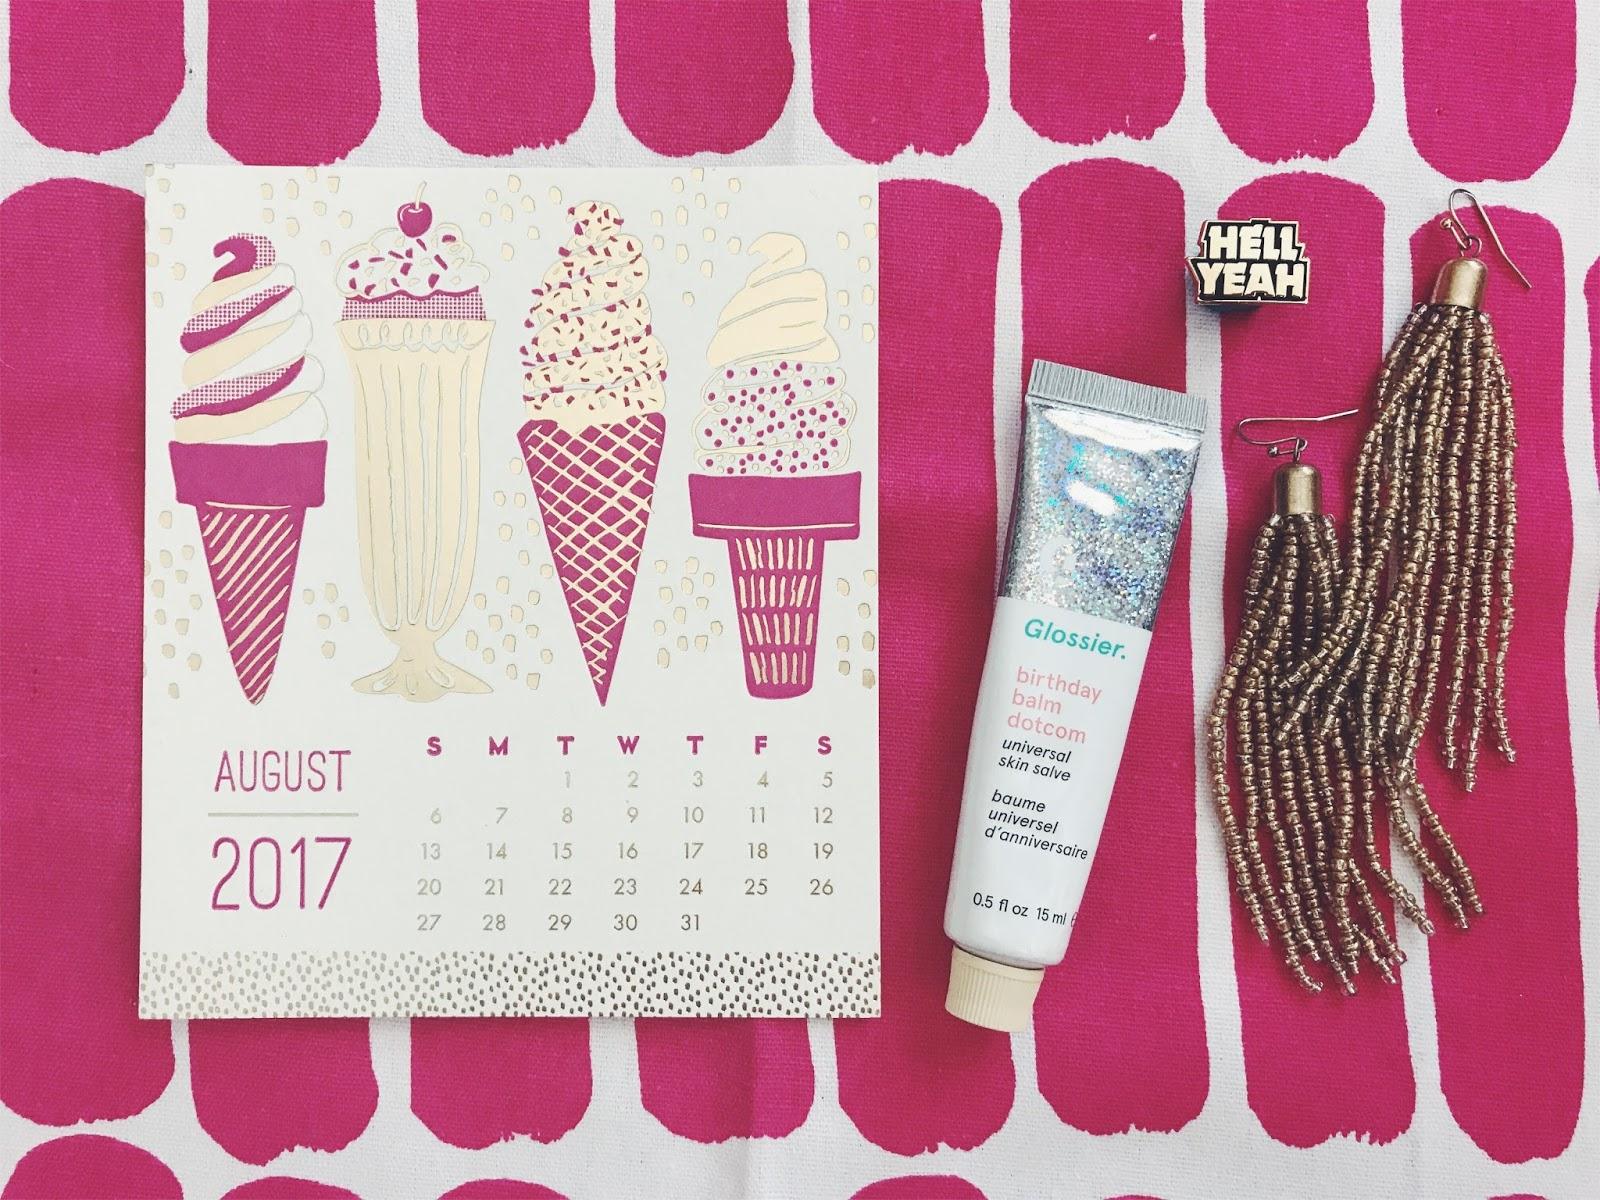 Priya the Blog, Nashville blogger, August 2017 update